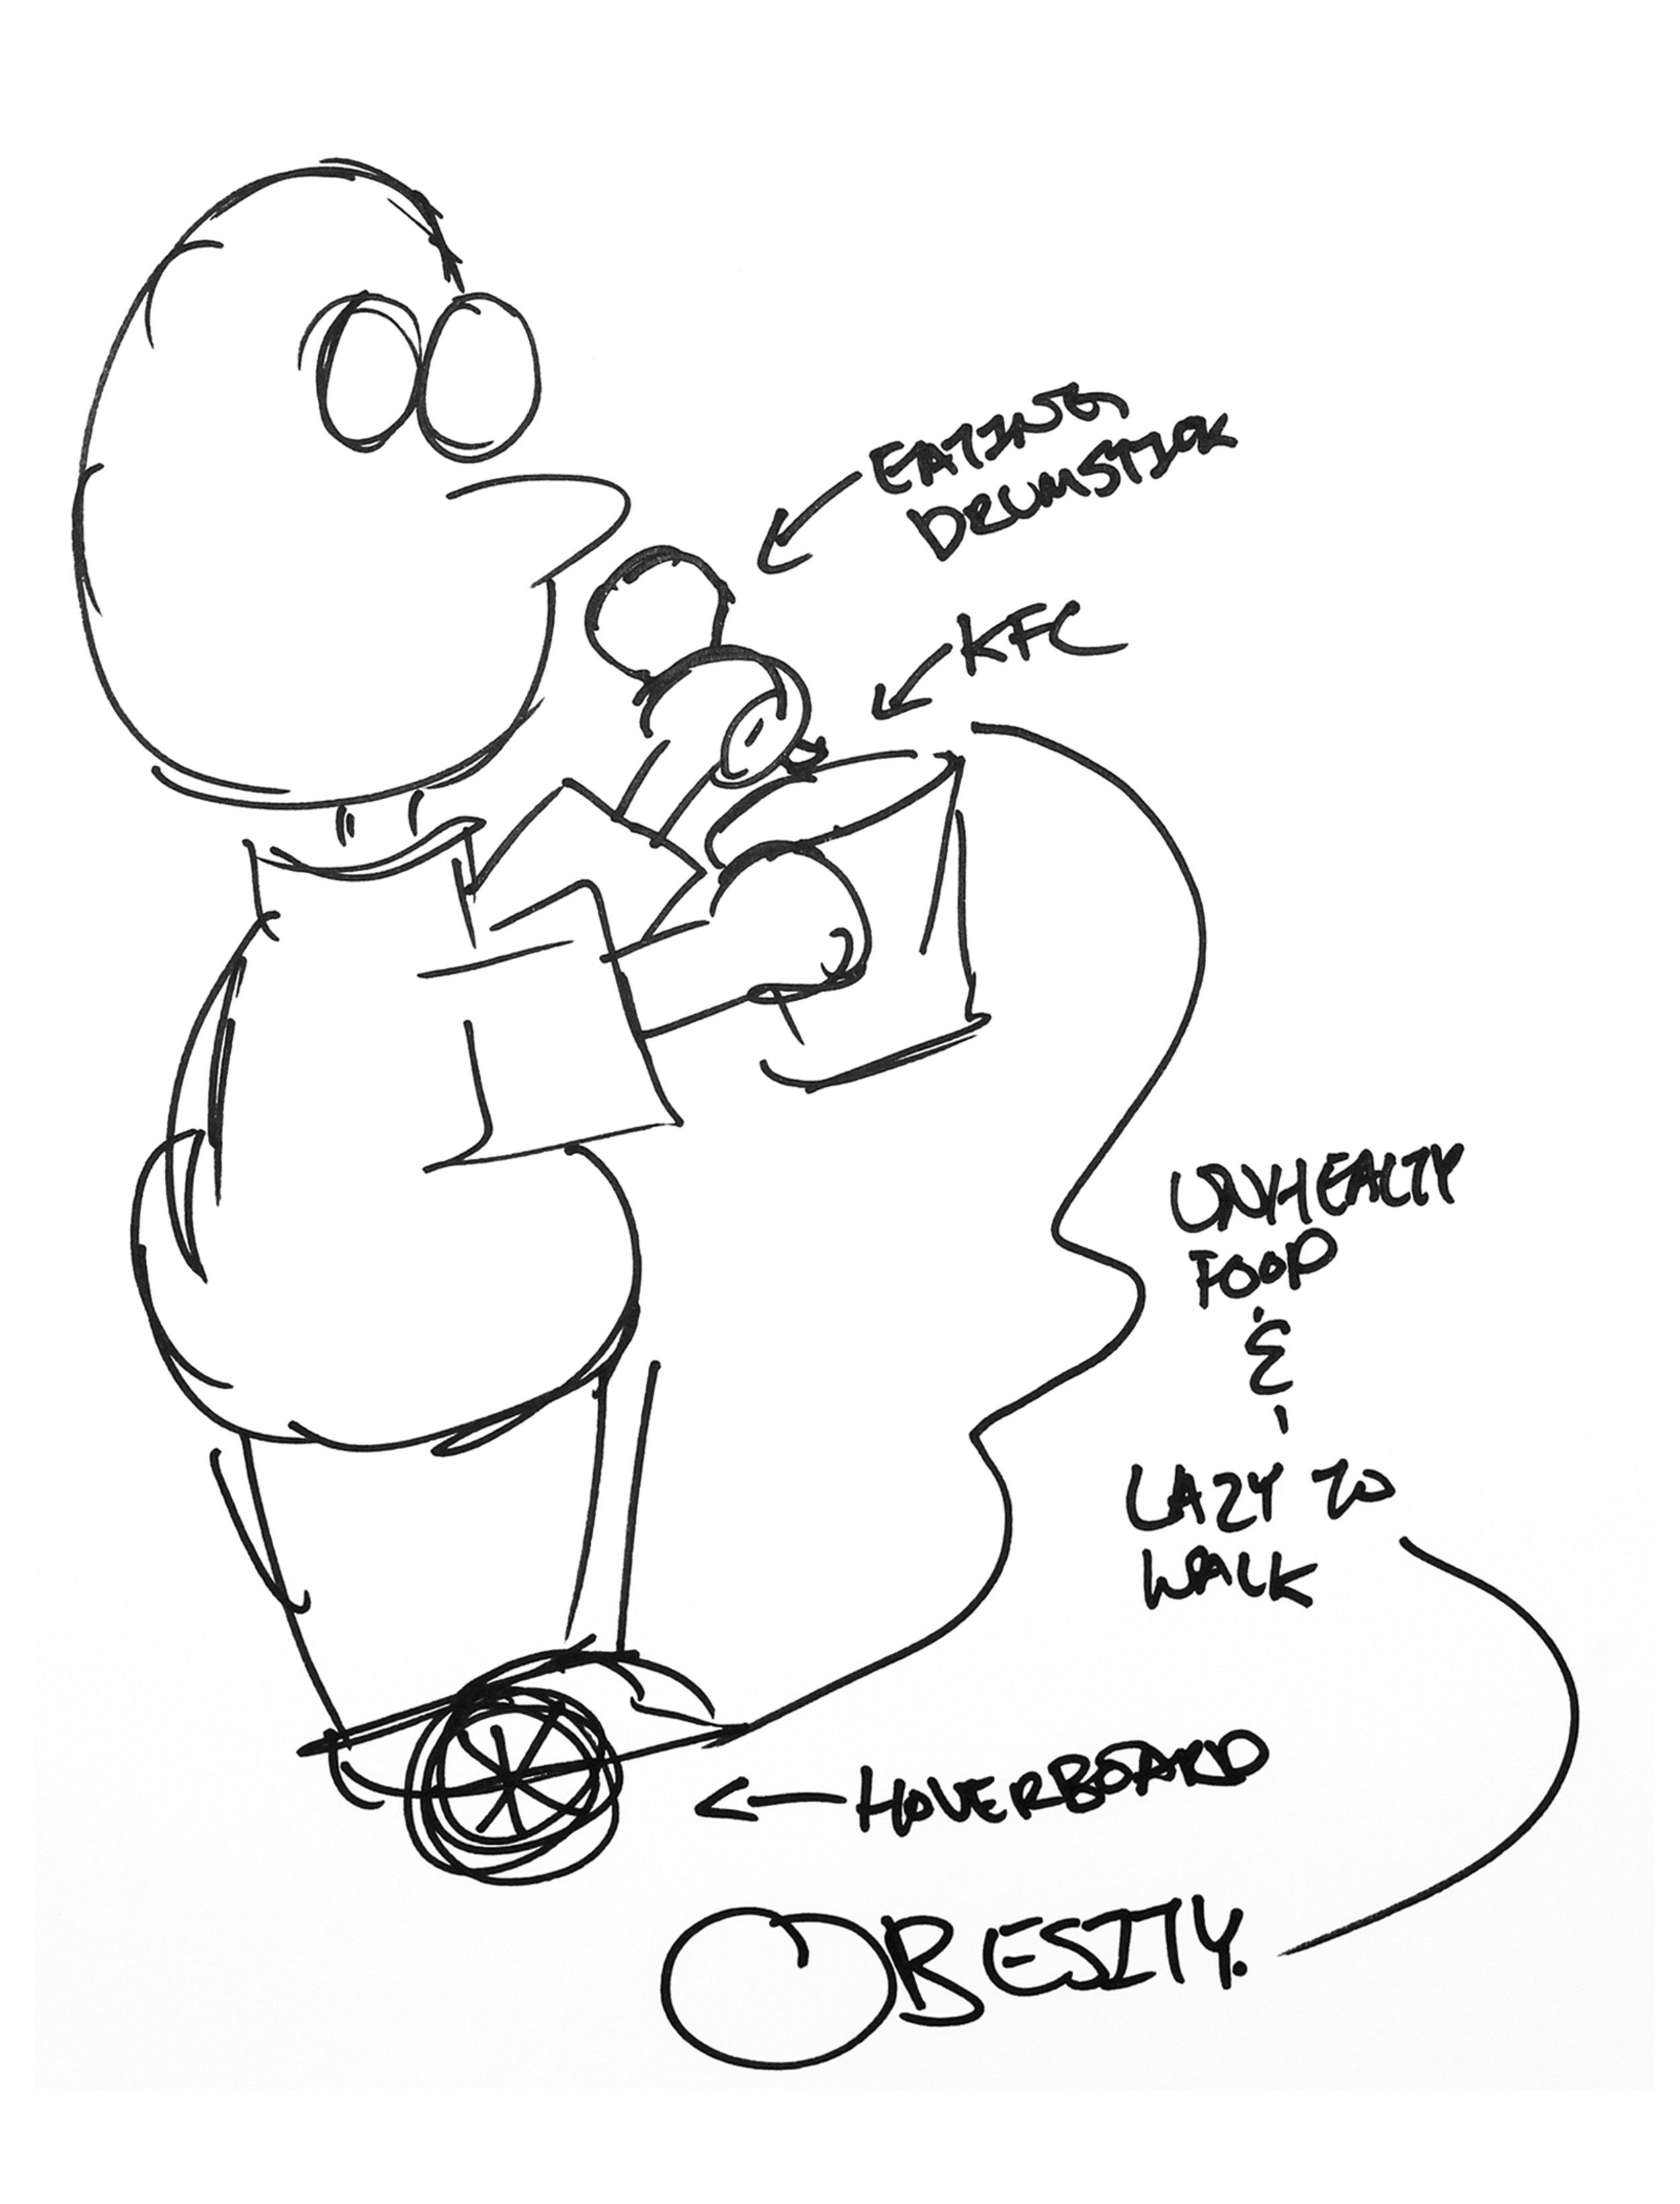 Illustration_Obesity_Plan.jpg